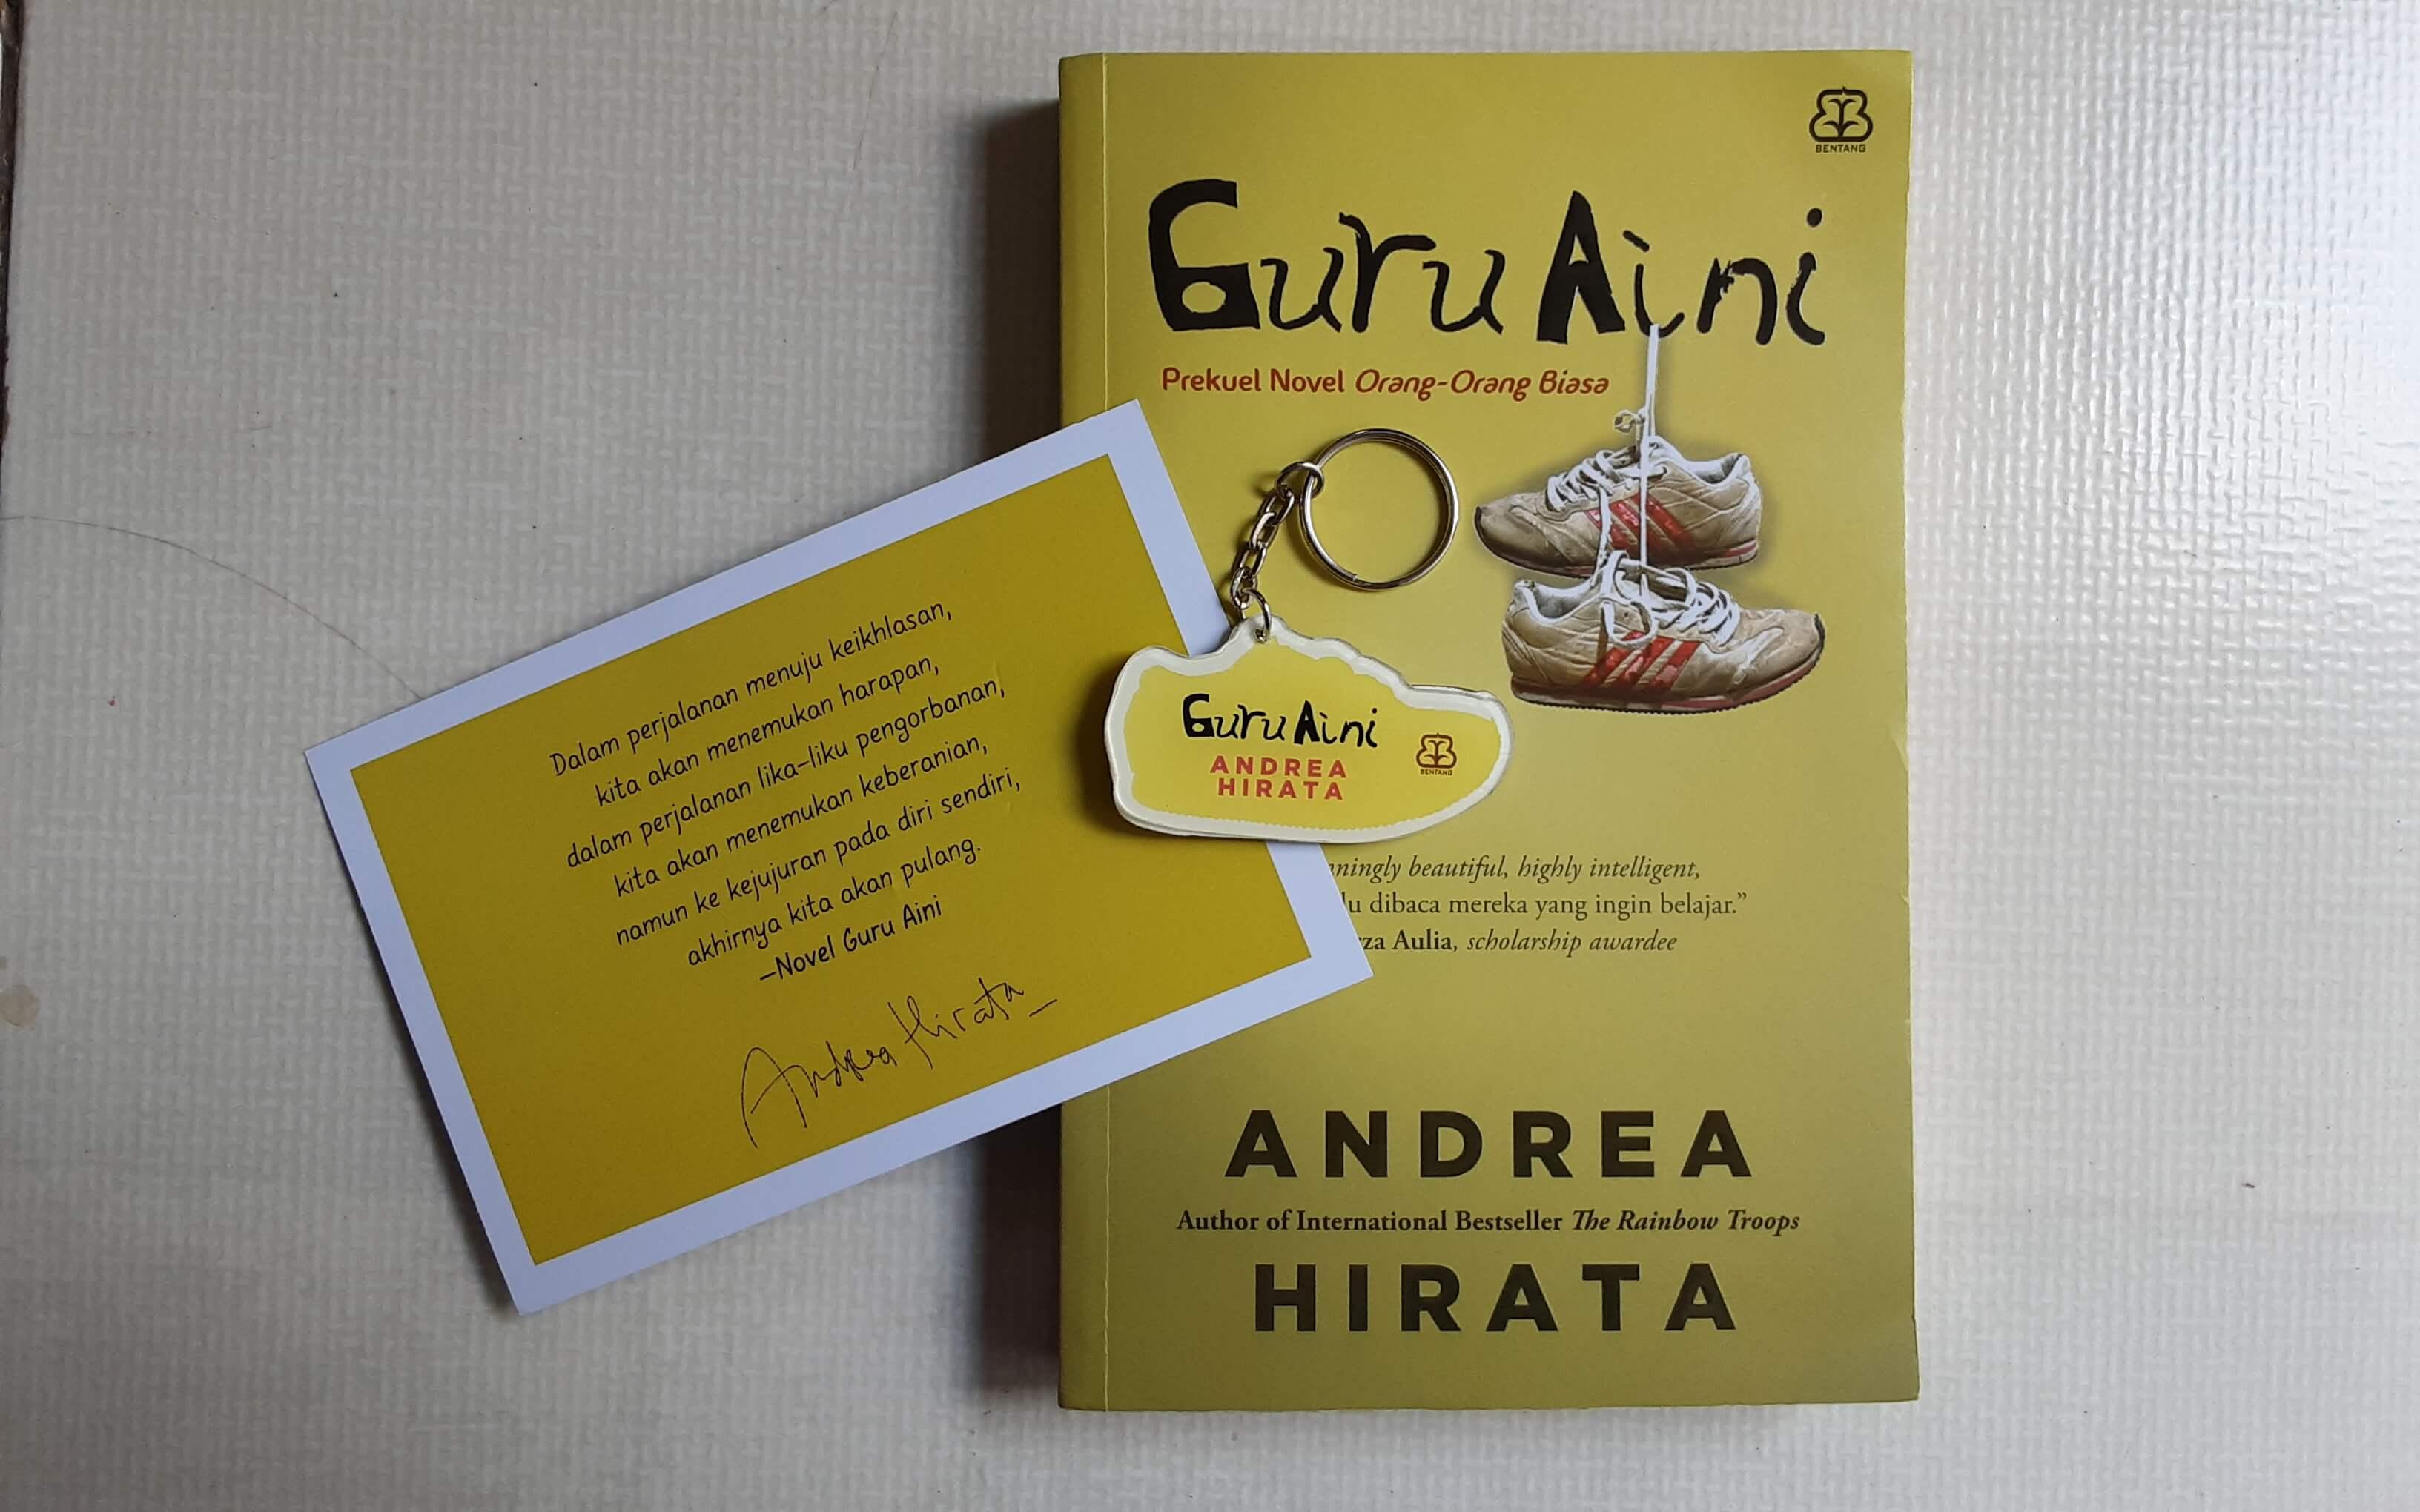 Buku Guru Aini - Novel Andrea Hirata